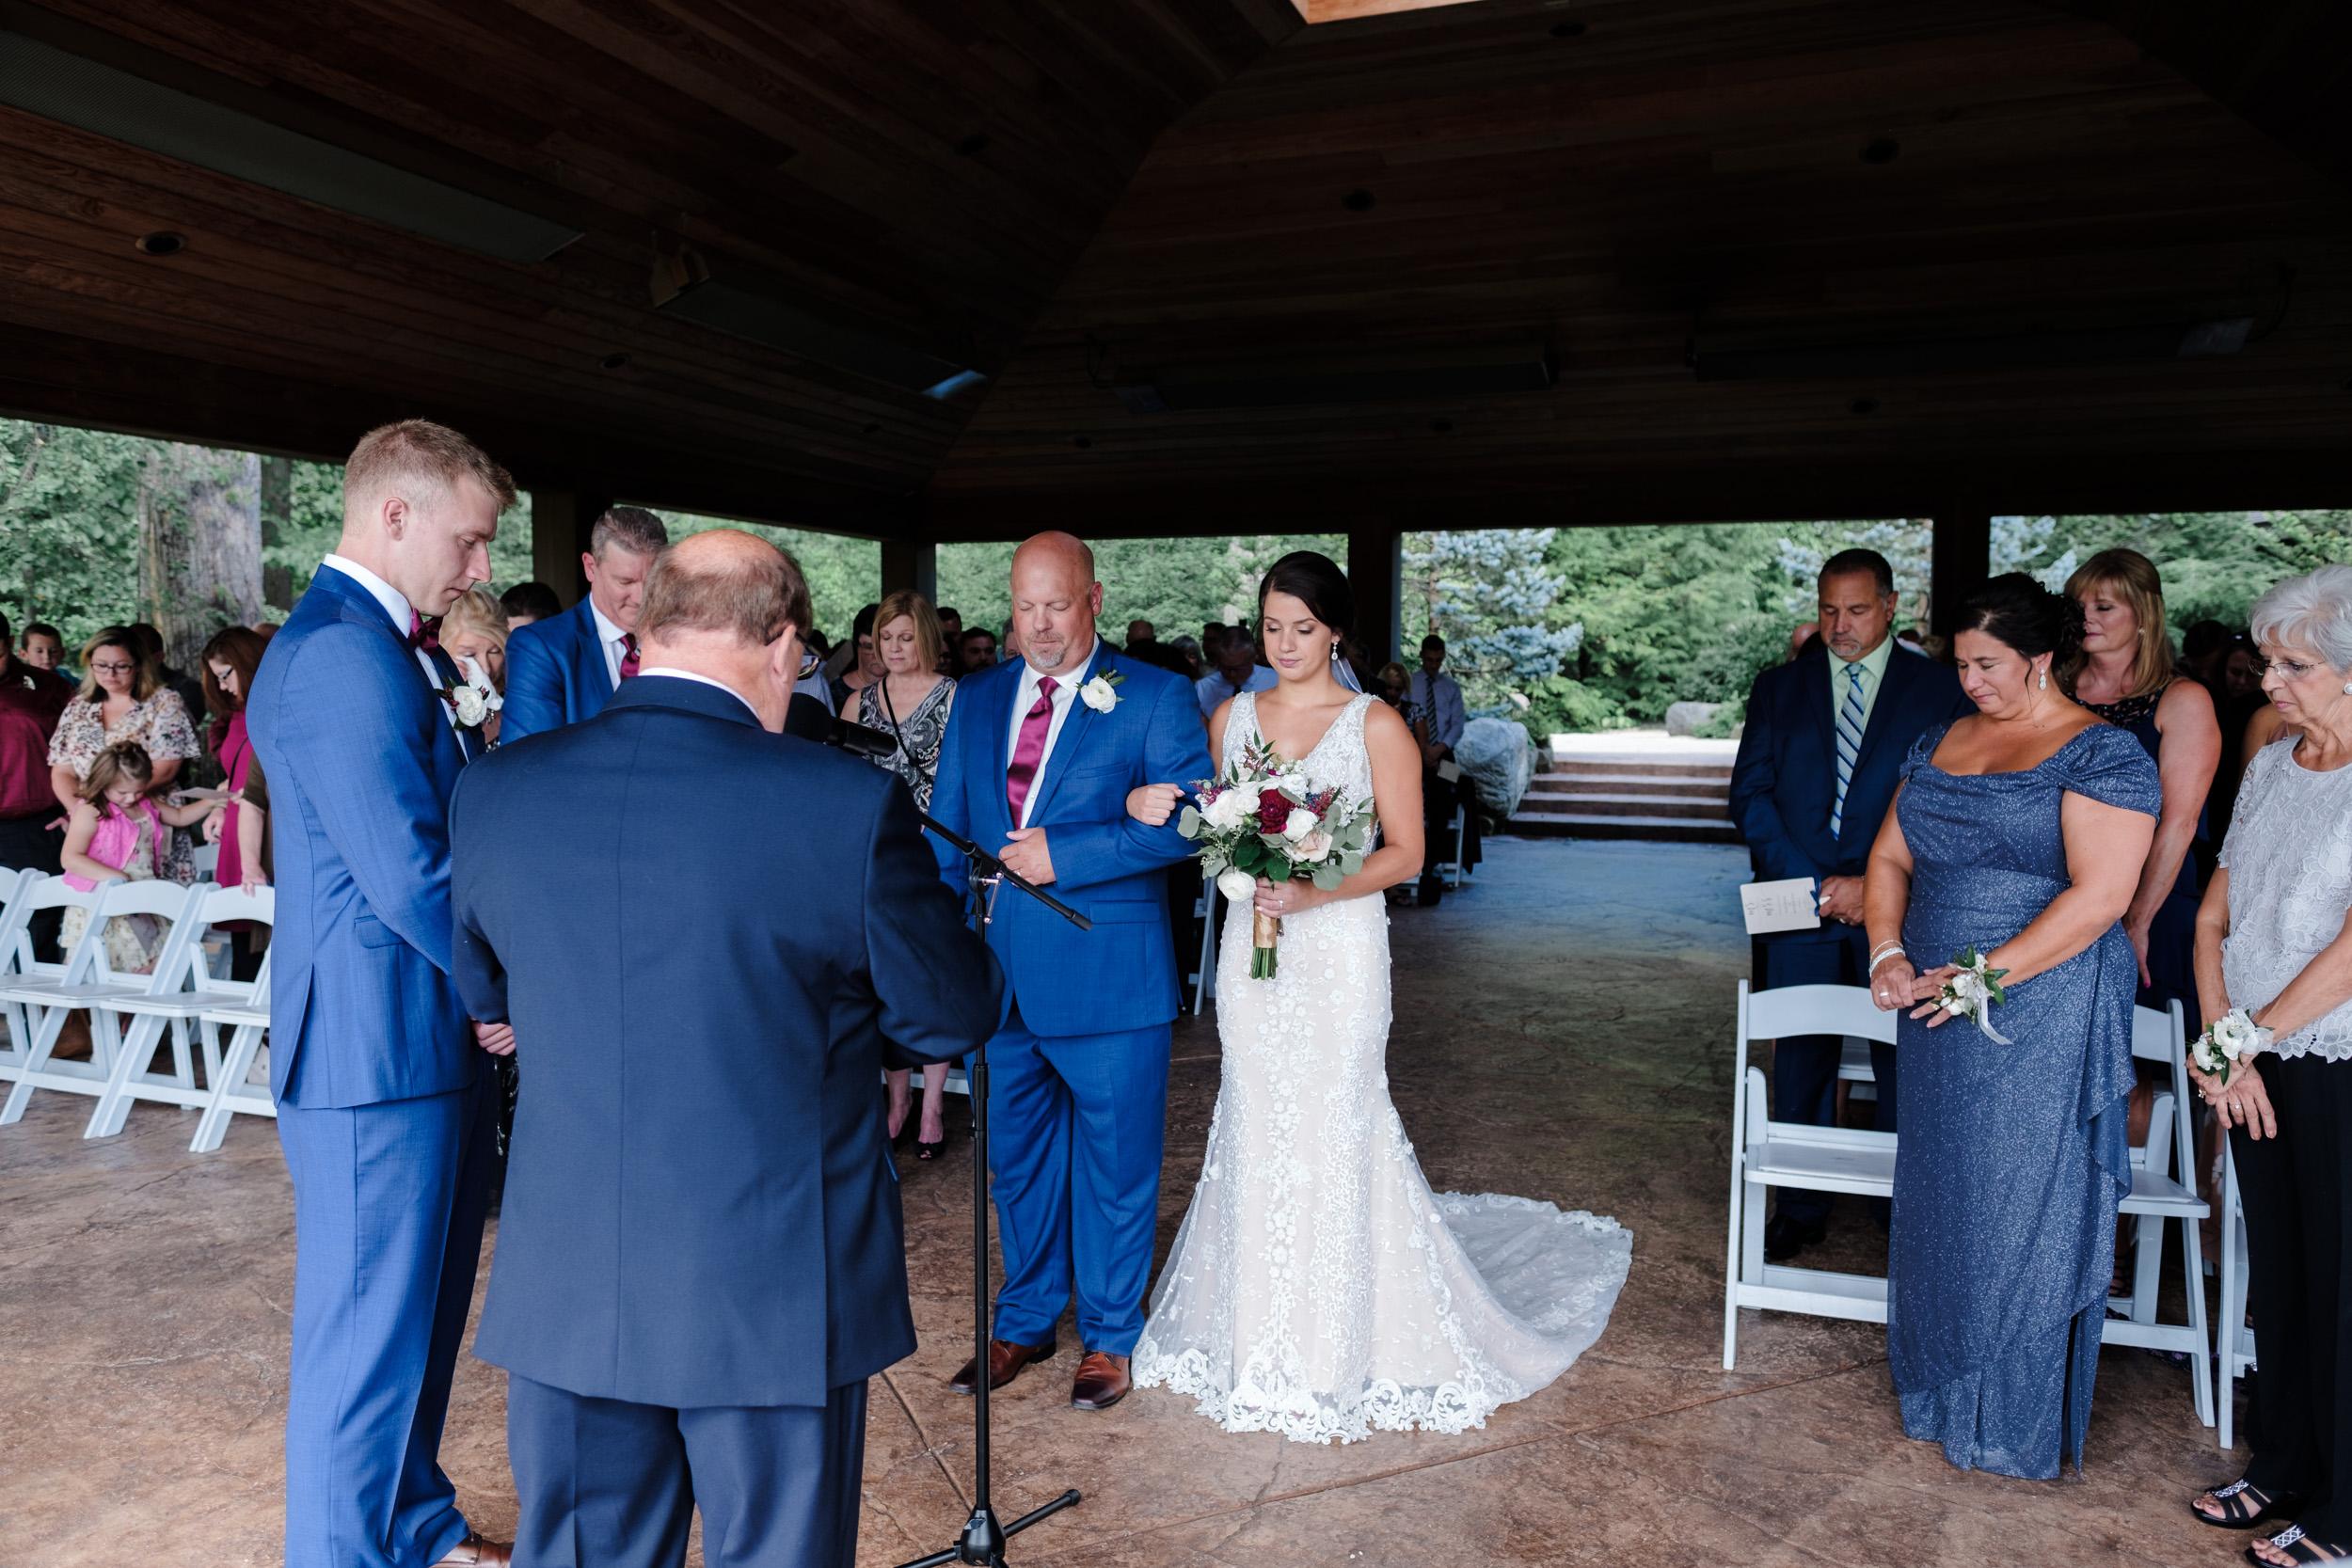 18-09-01 BAP Kiley-Trevor-Anderson-Gardens-Wedding-32.jpg